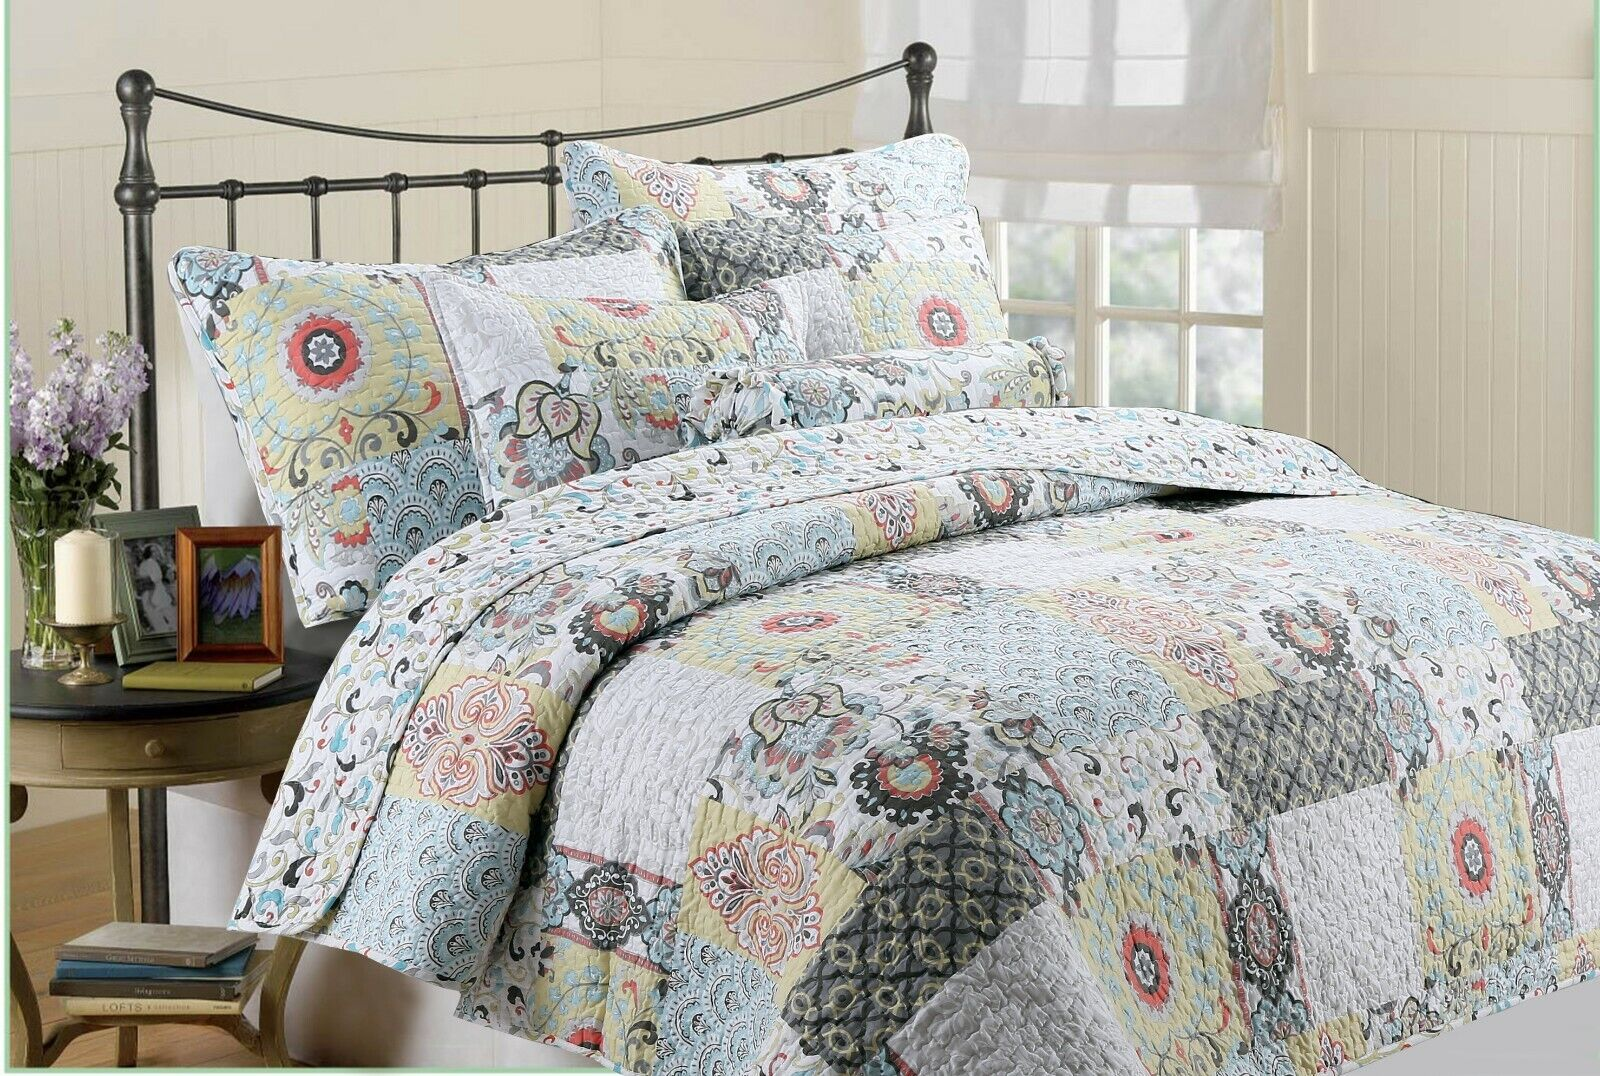 moorea reversible quilt set bedspread coverlet